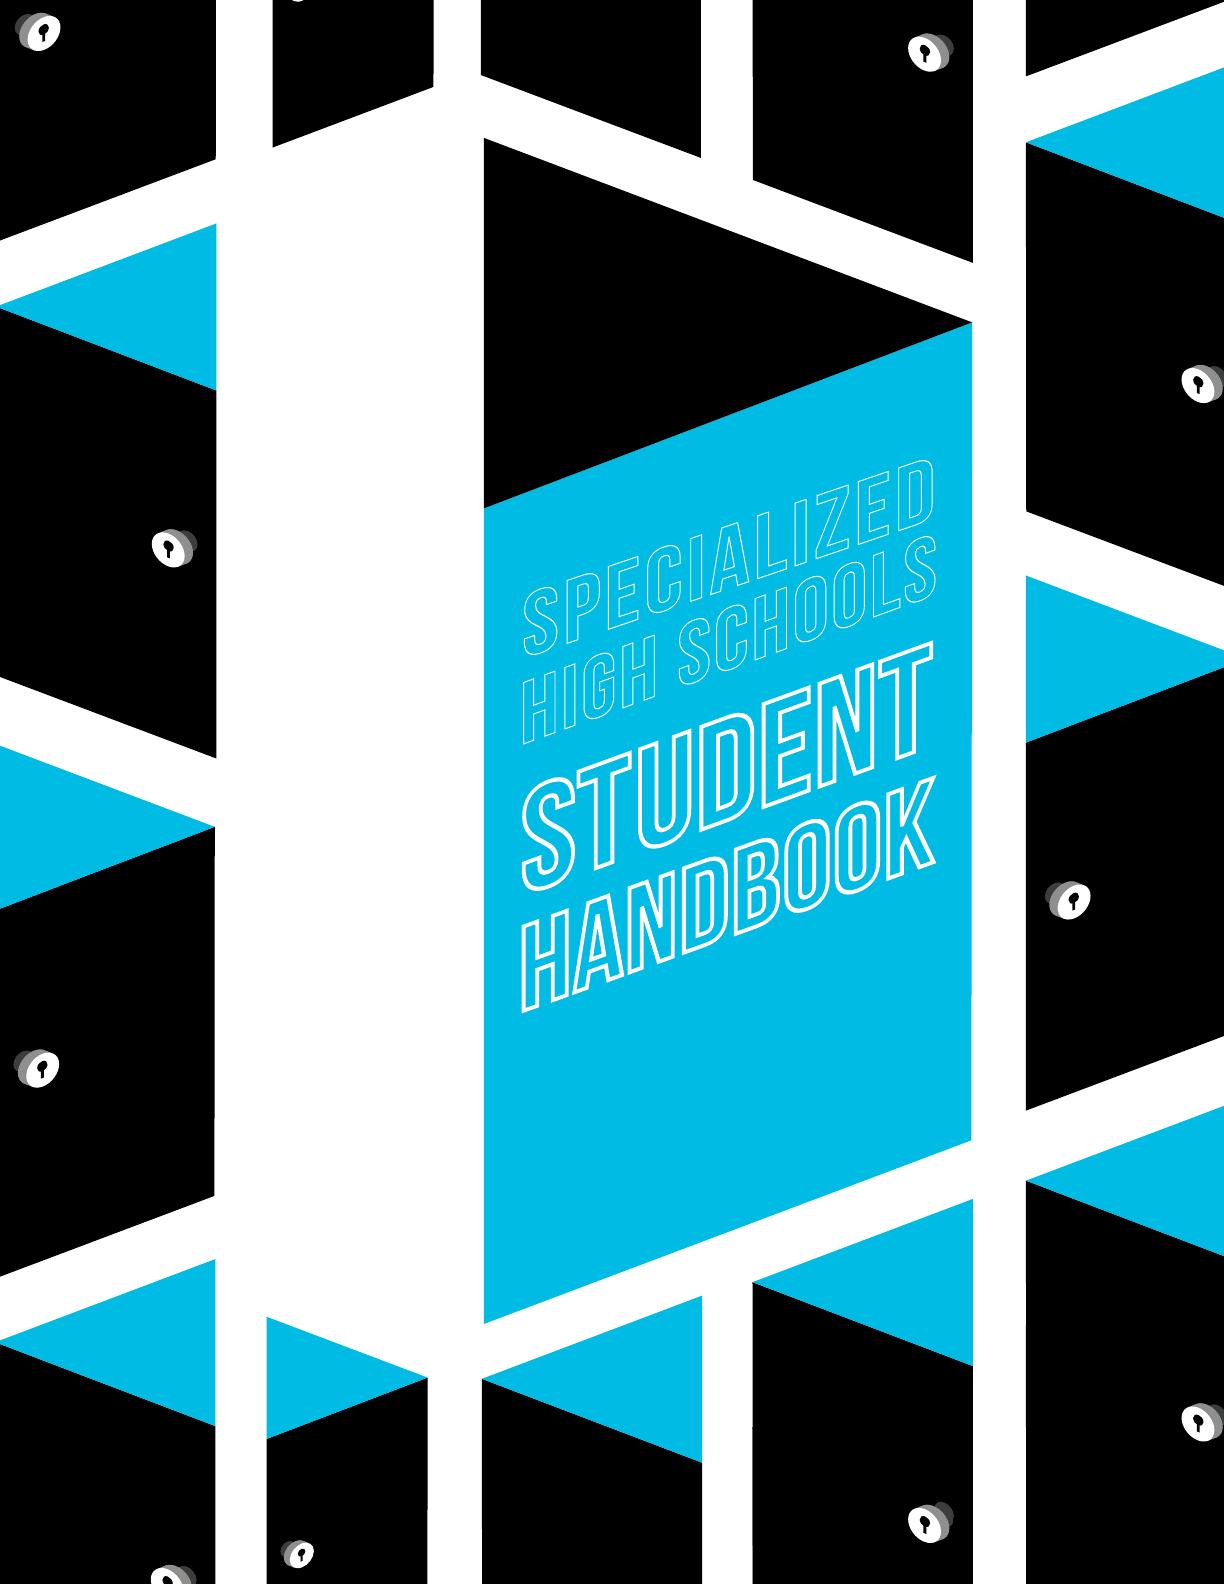 Shsat_Studenthandbook 2011-2012 - [Pdf Document]